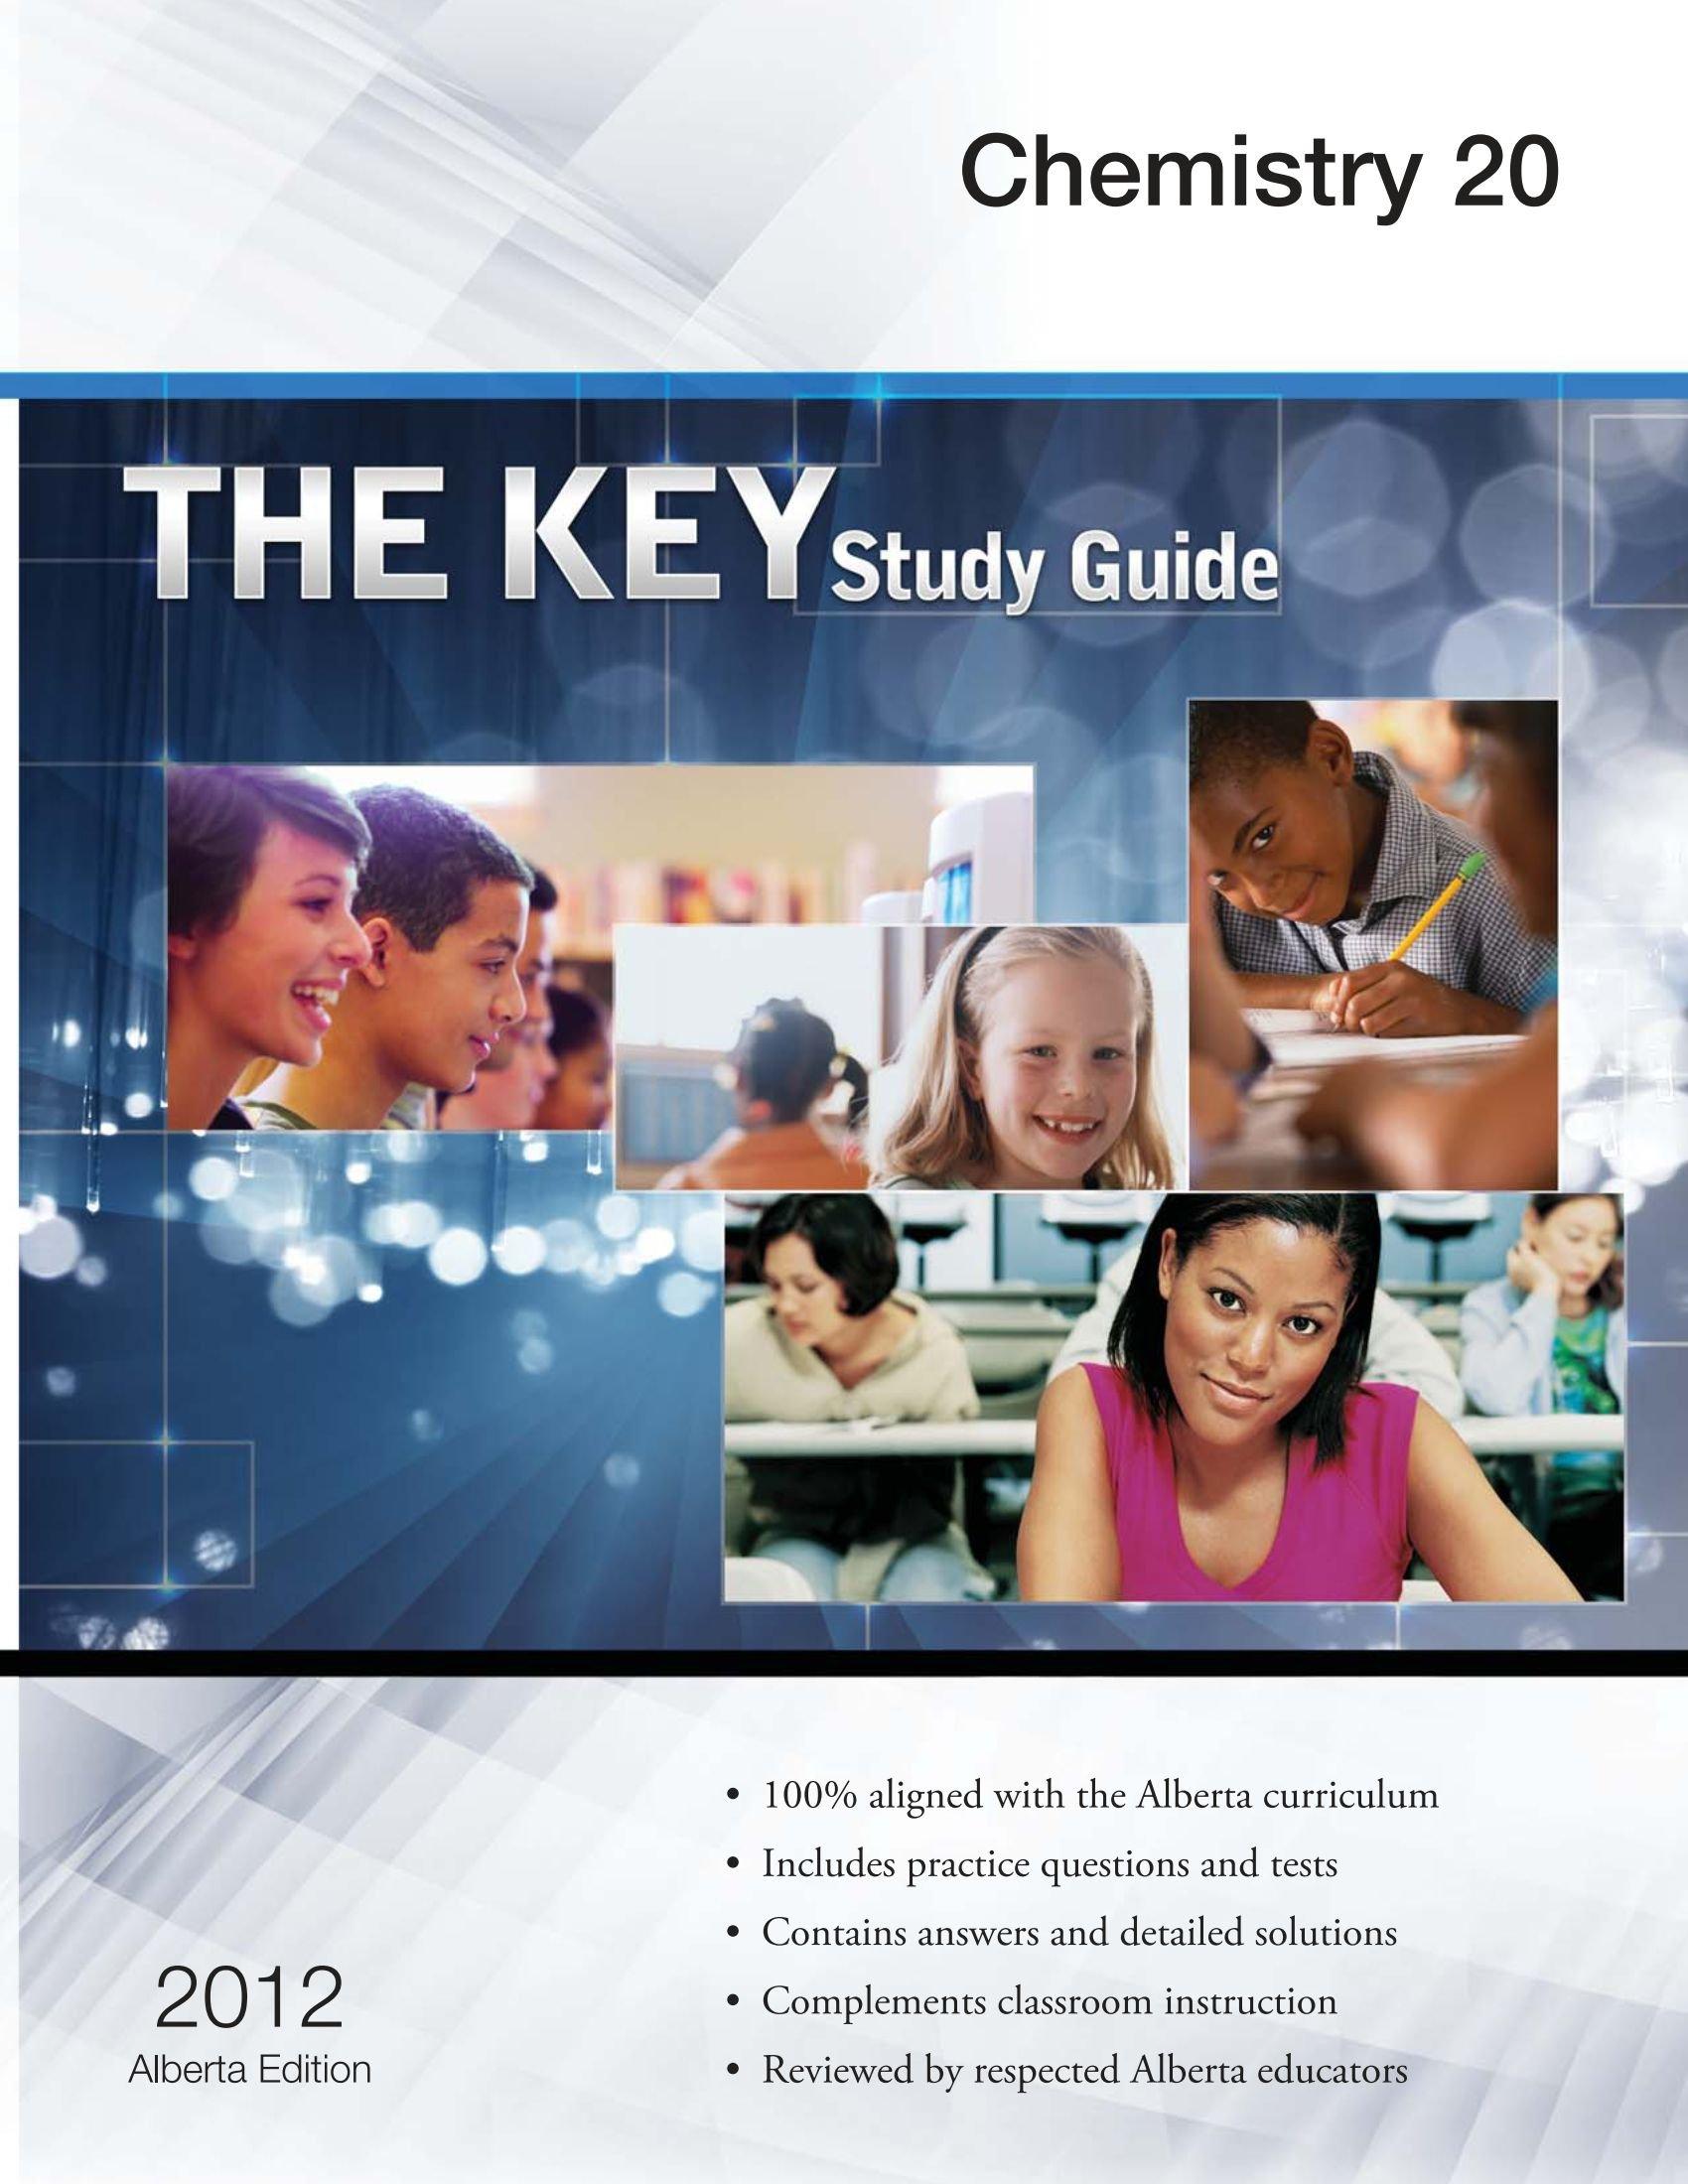 The Key Study Guide Chemistry 20: Gautam Rao: 9781770442184: Amazon